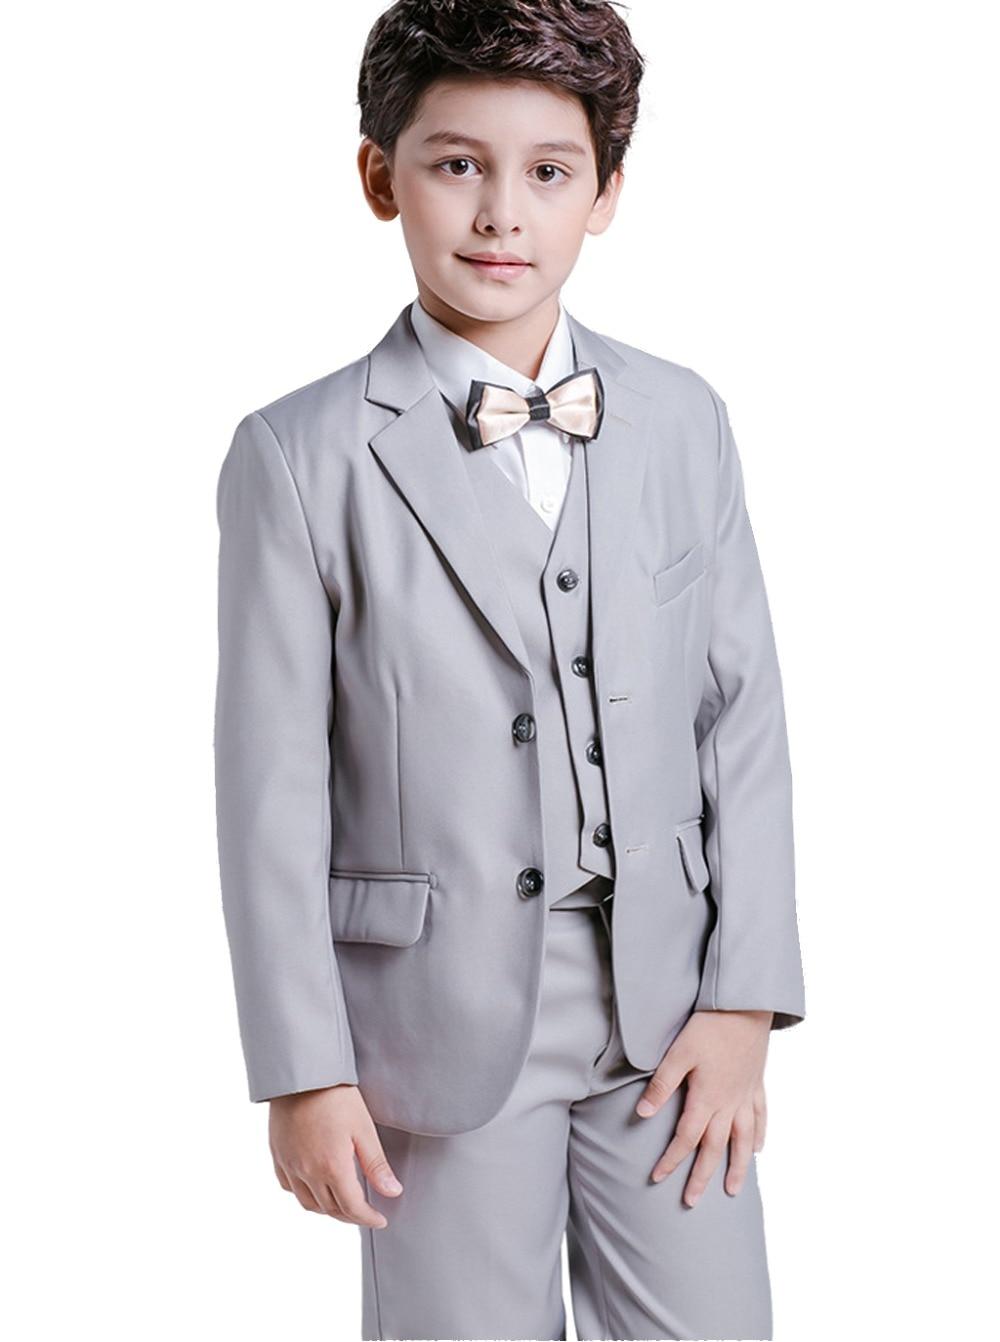 цены 5 Piece Boys Grey Suits Slim Fit Ring Bearer Suit For Boys Formal Classic Costume Weddings